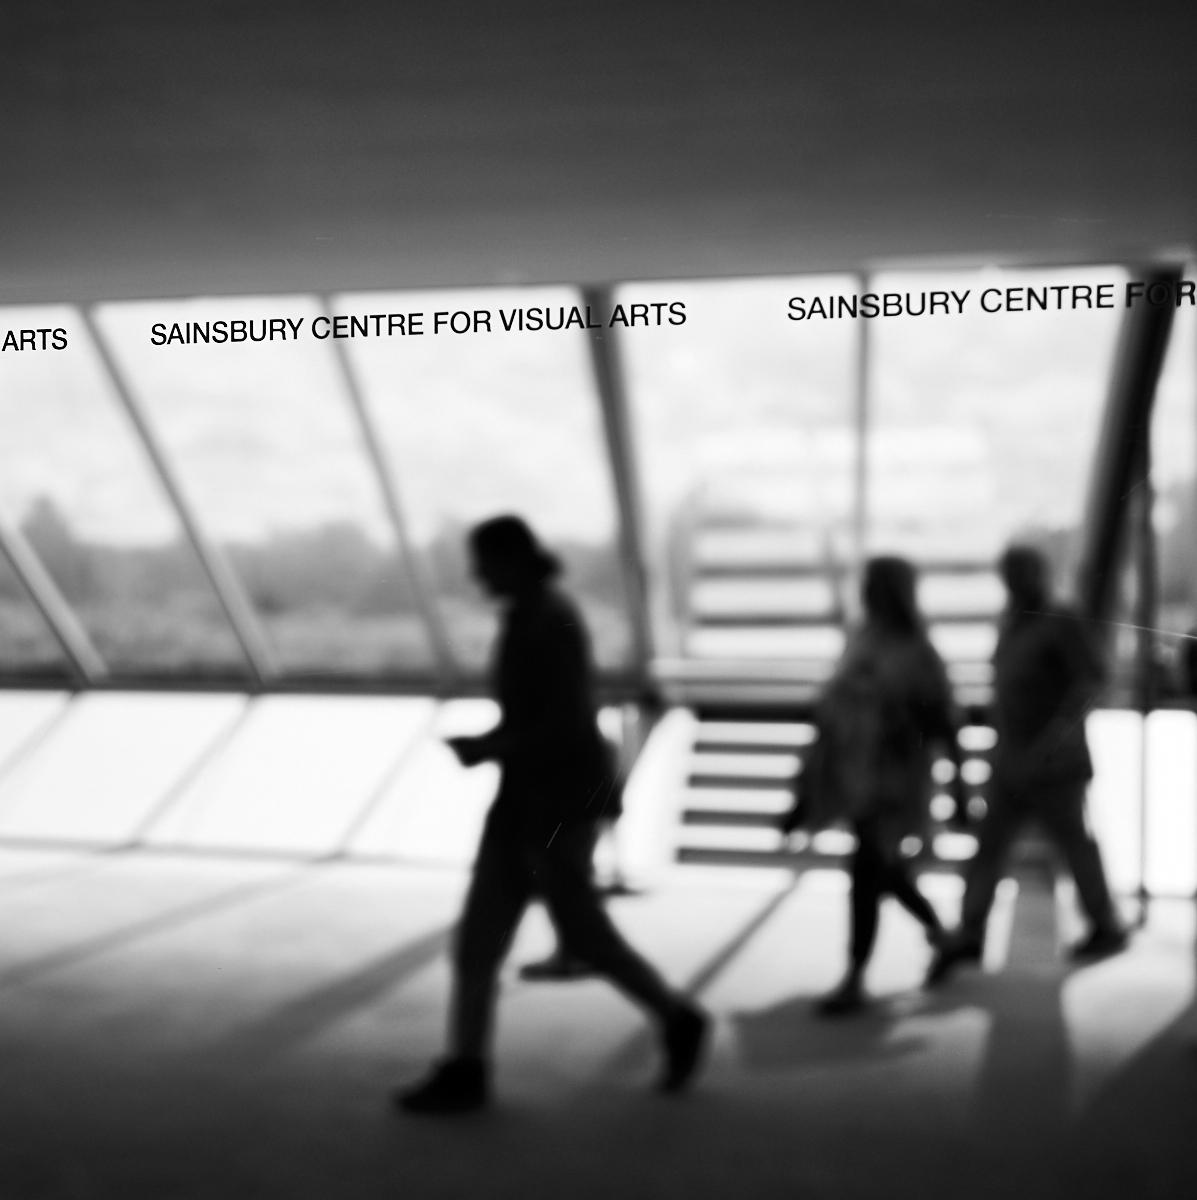 Sainsbury 3 1600x1200 sRGB.jpg